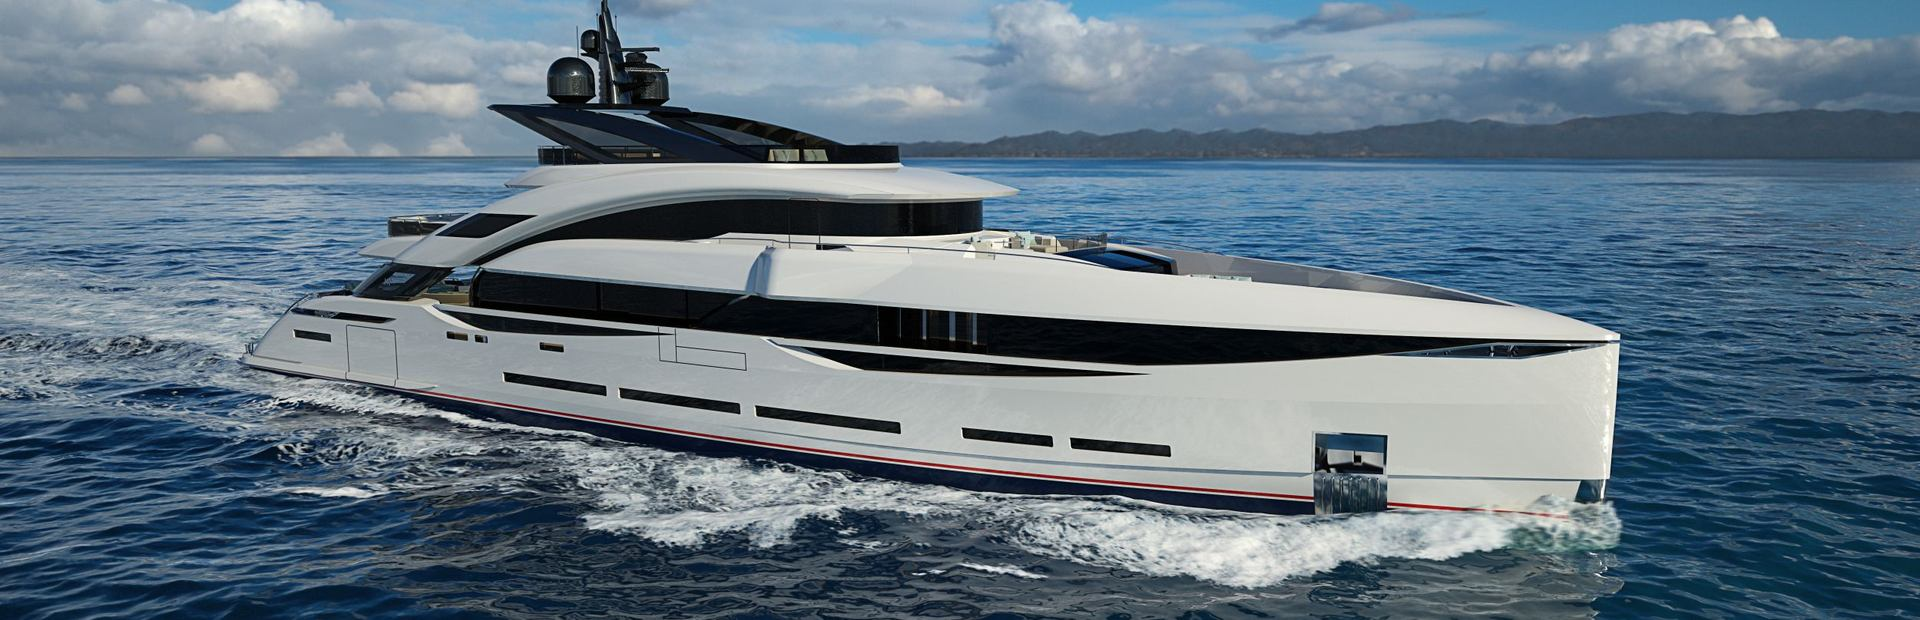 GranTurismo 45 Yacht Charter